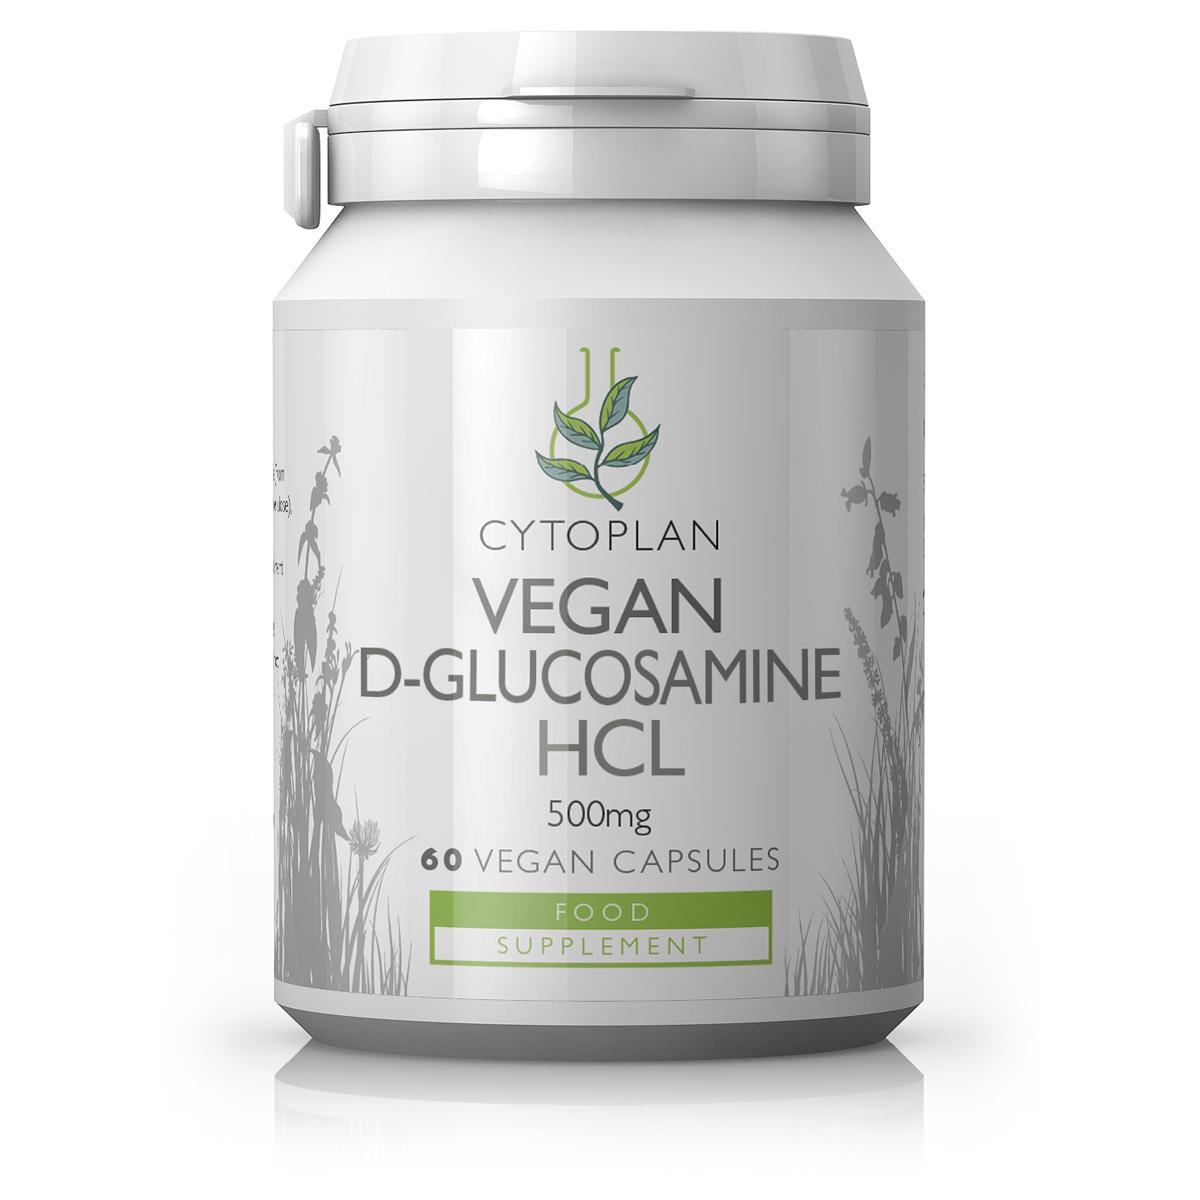 Vegan D-Glucosamine HCL 500mg 60's